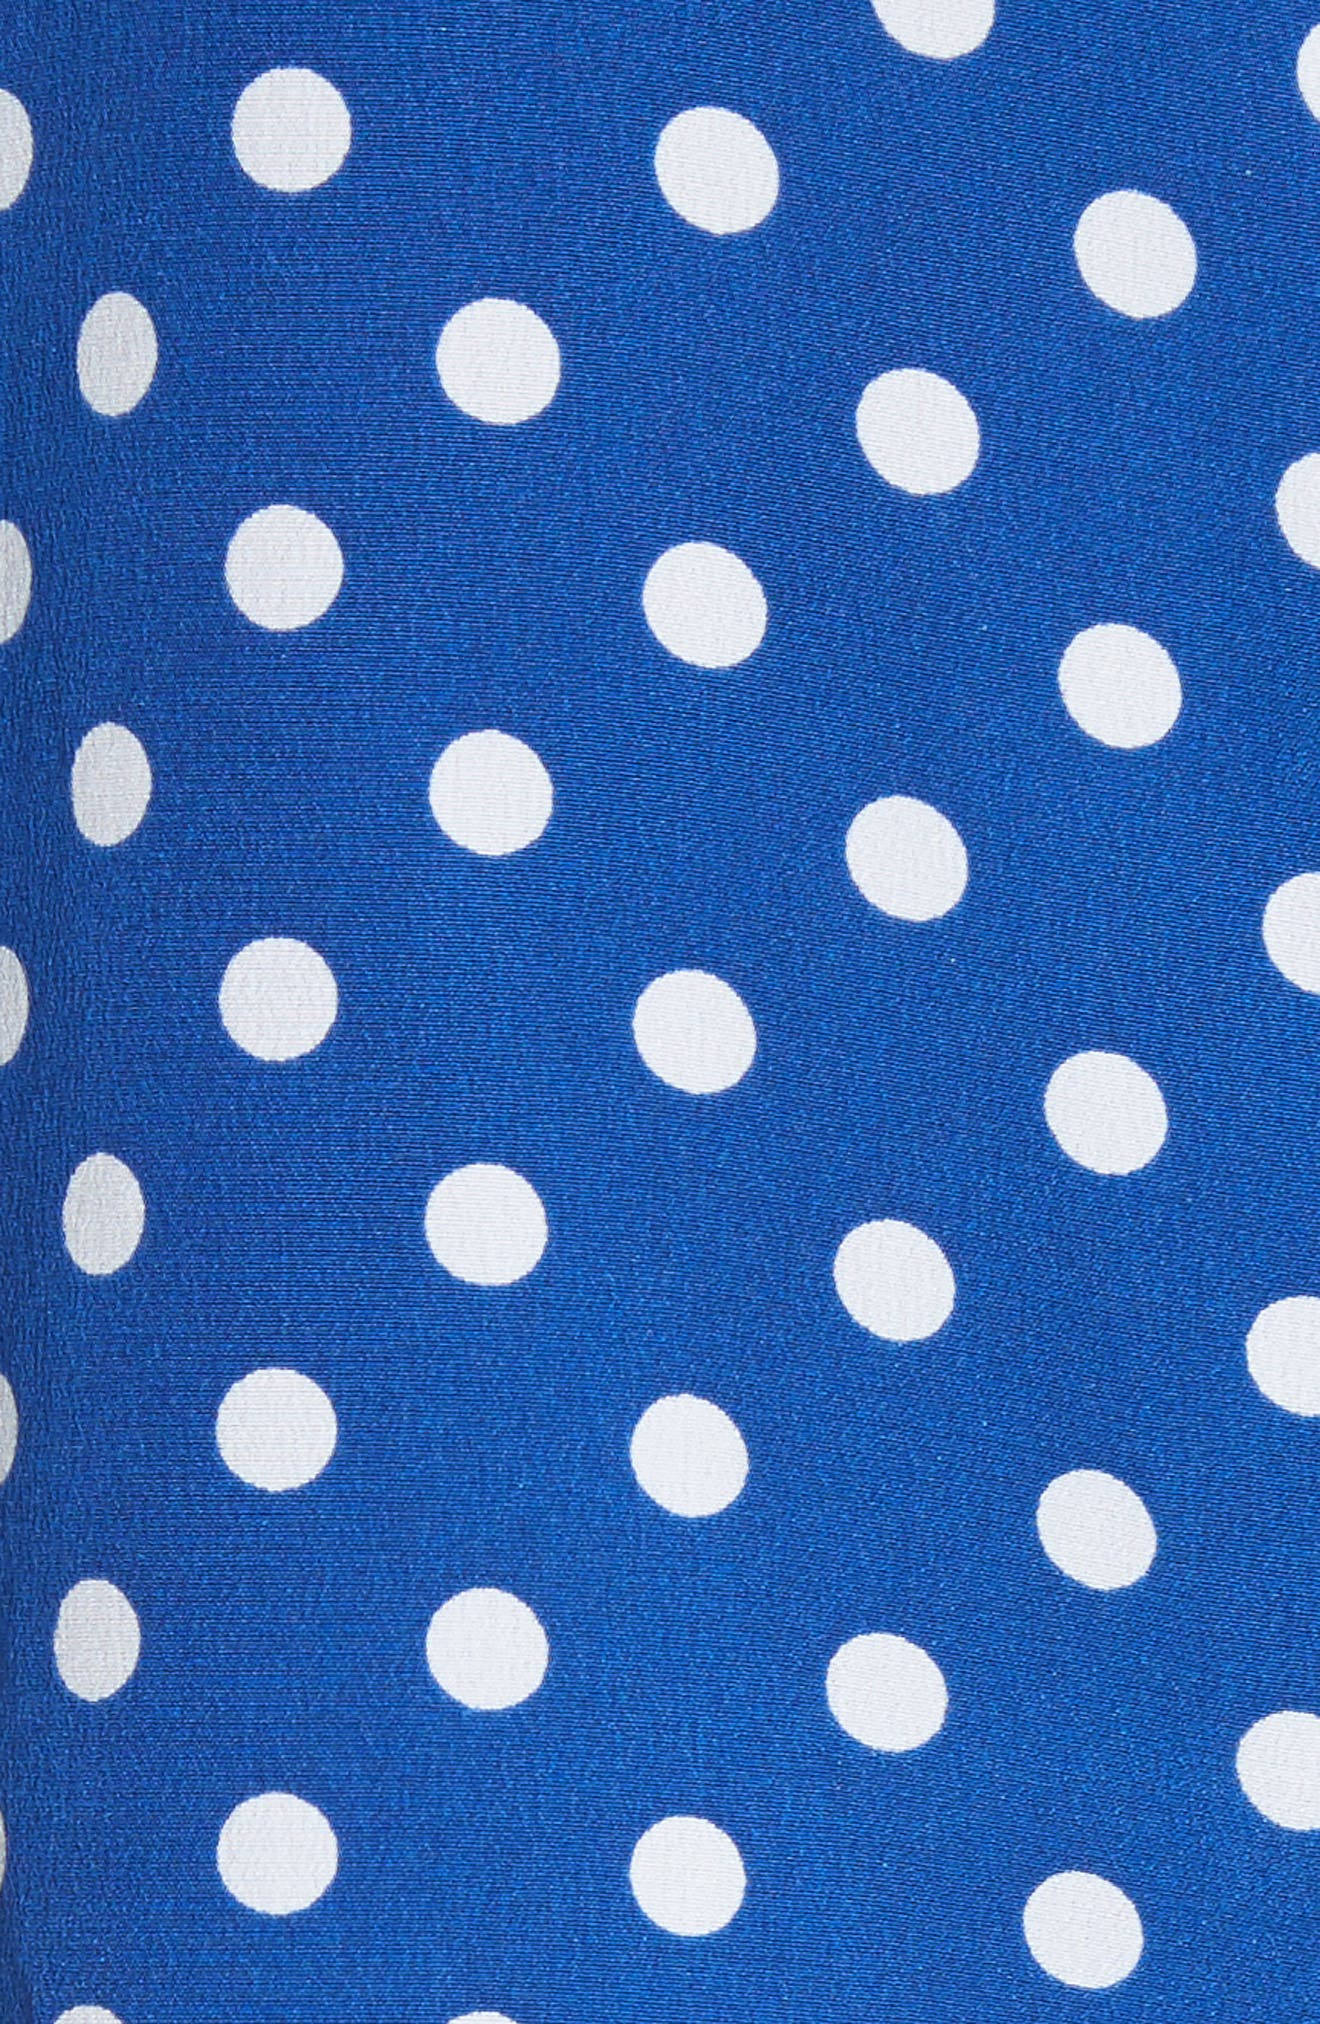 Brynn Polka Dot Silk Tee,                             Alternate thumbnail 5, color,                             472